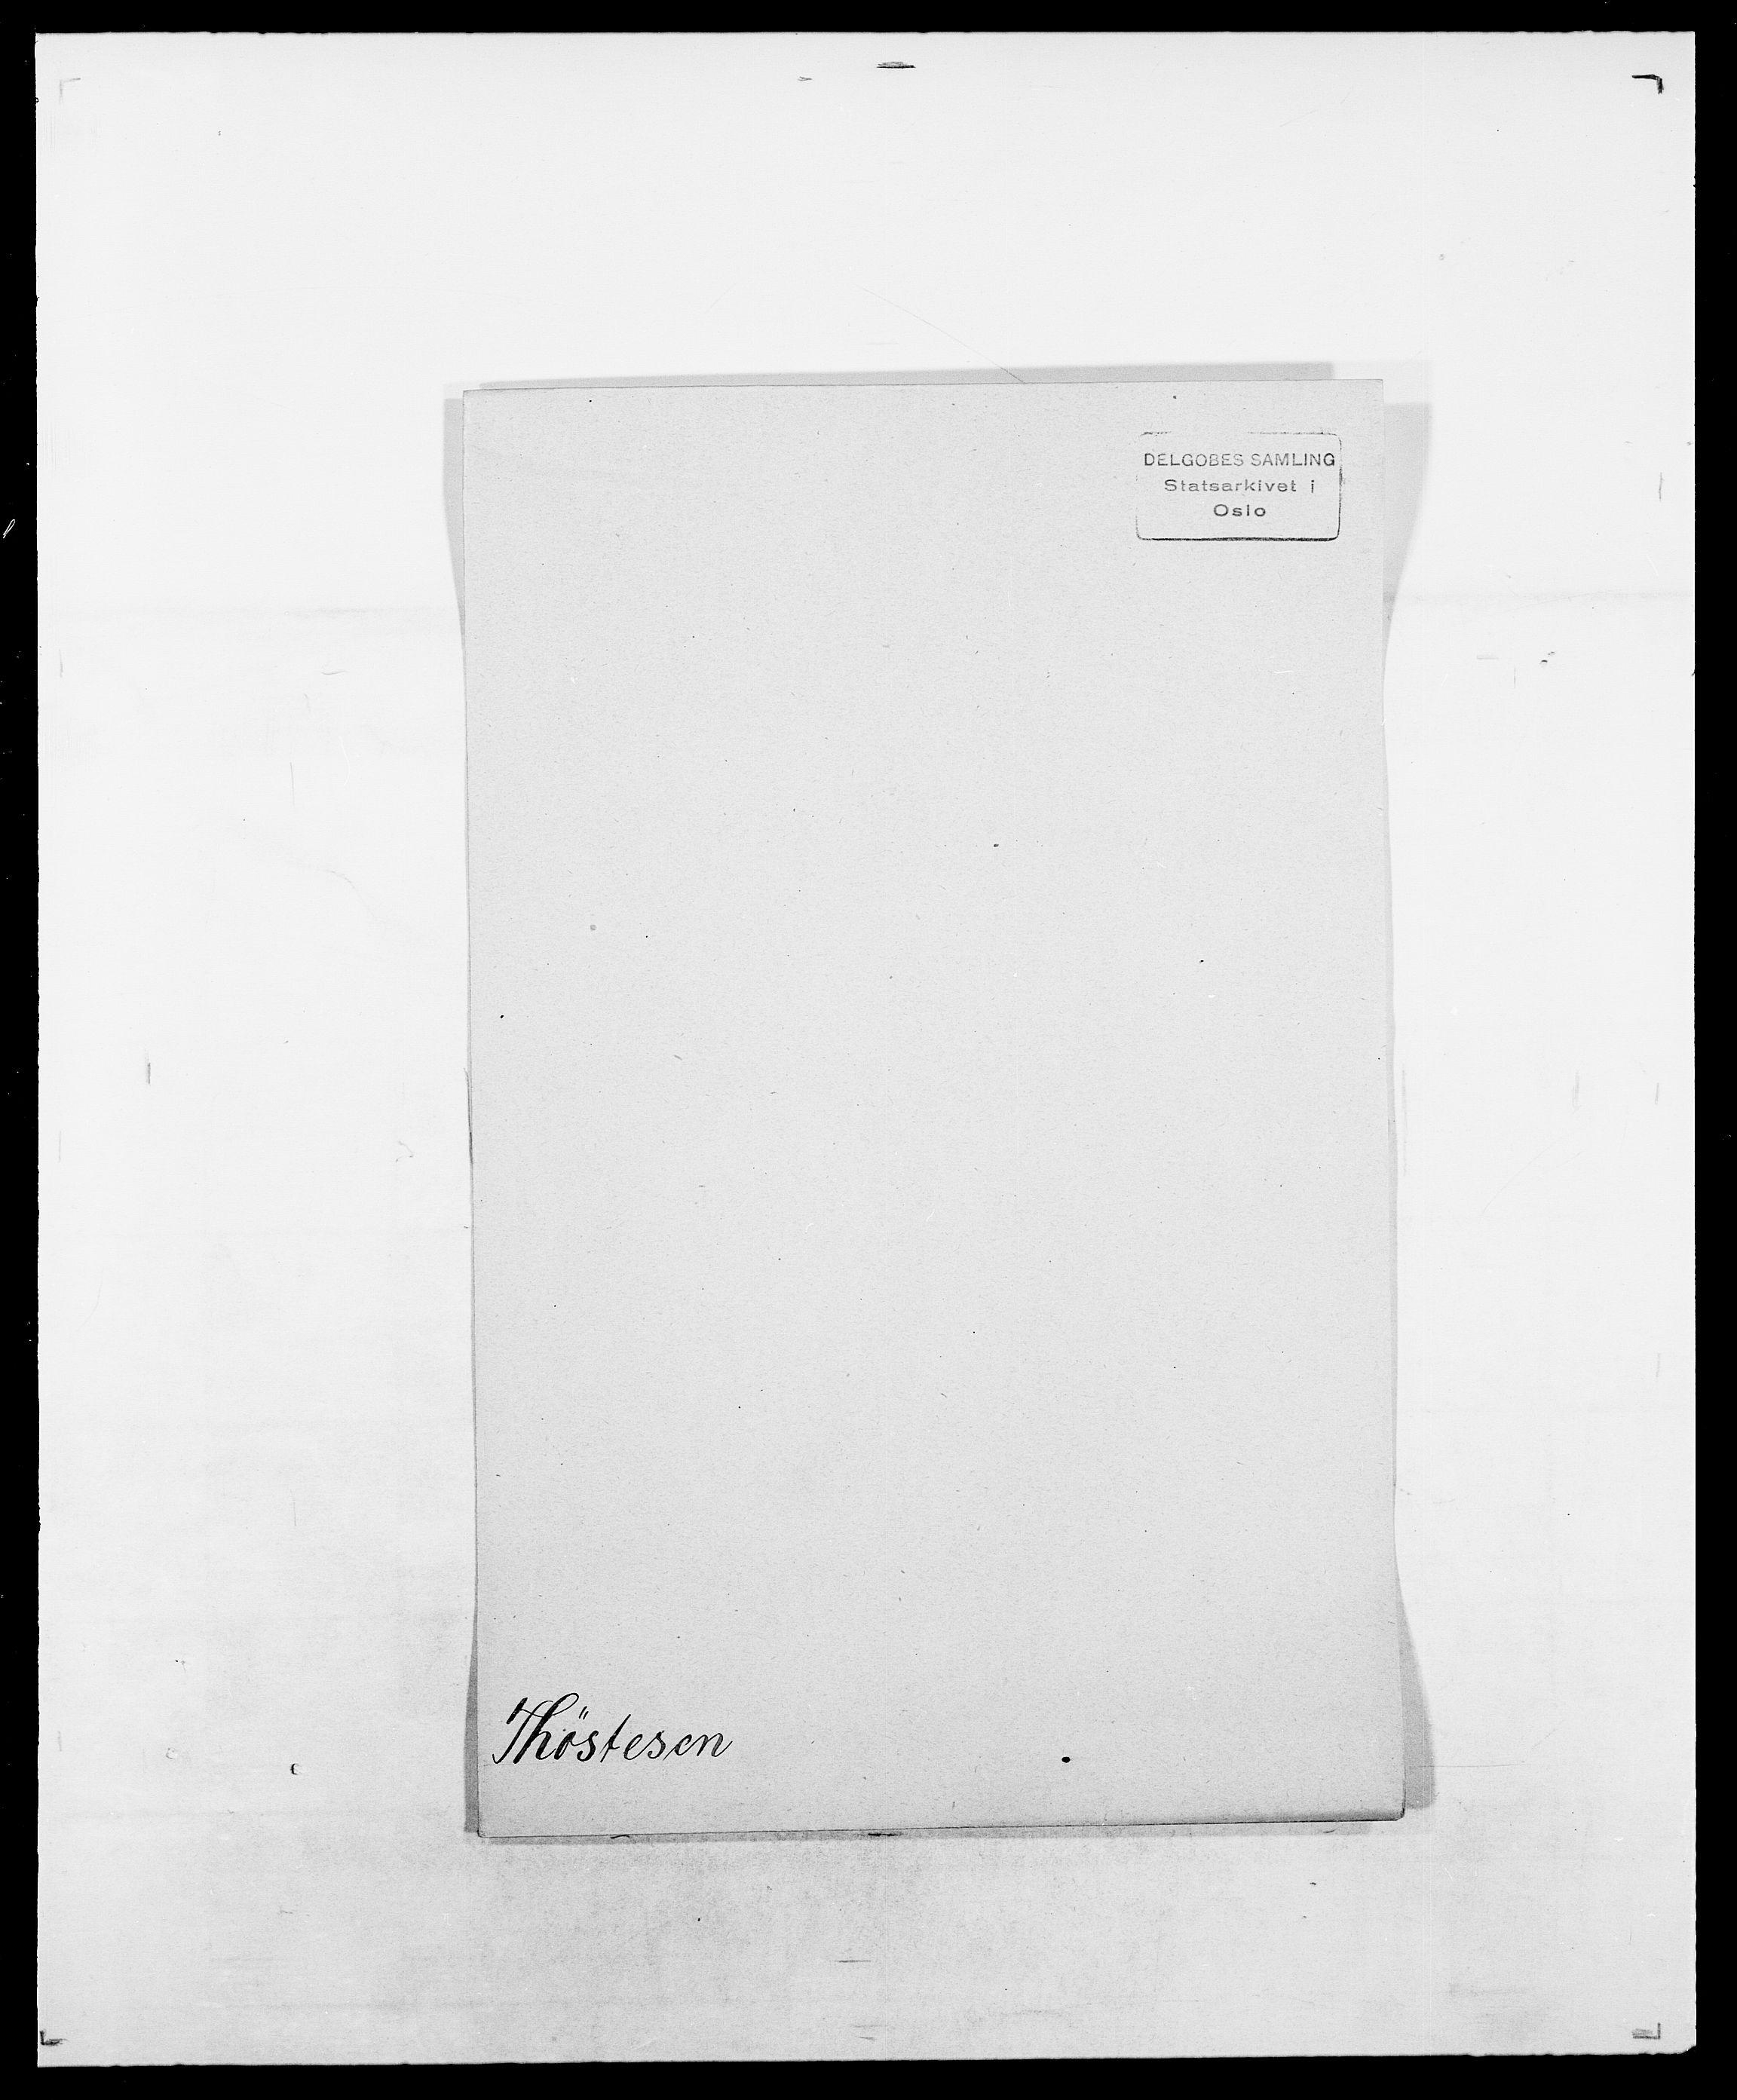 SAO, Delgobe, Charles Antoine - samling, D/Da/L0039: Thorsen - Urup, s. 8